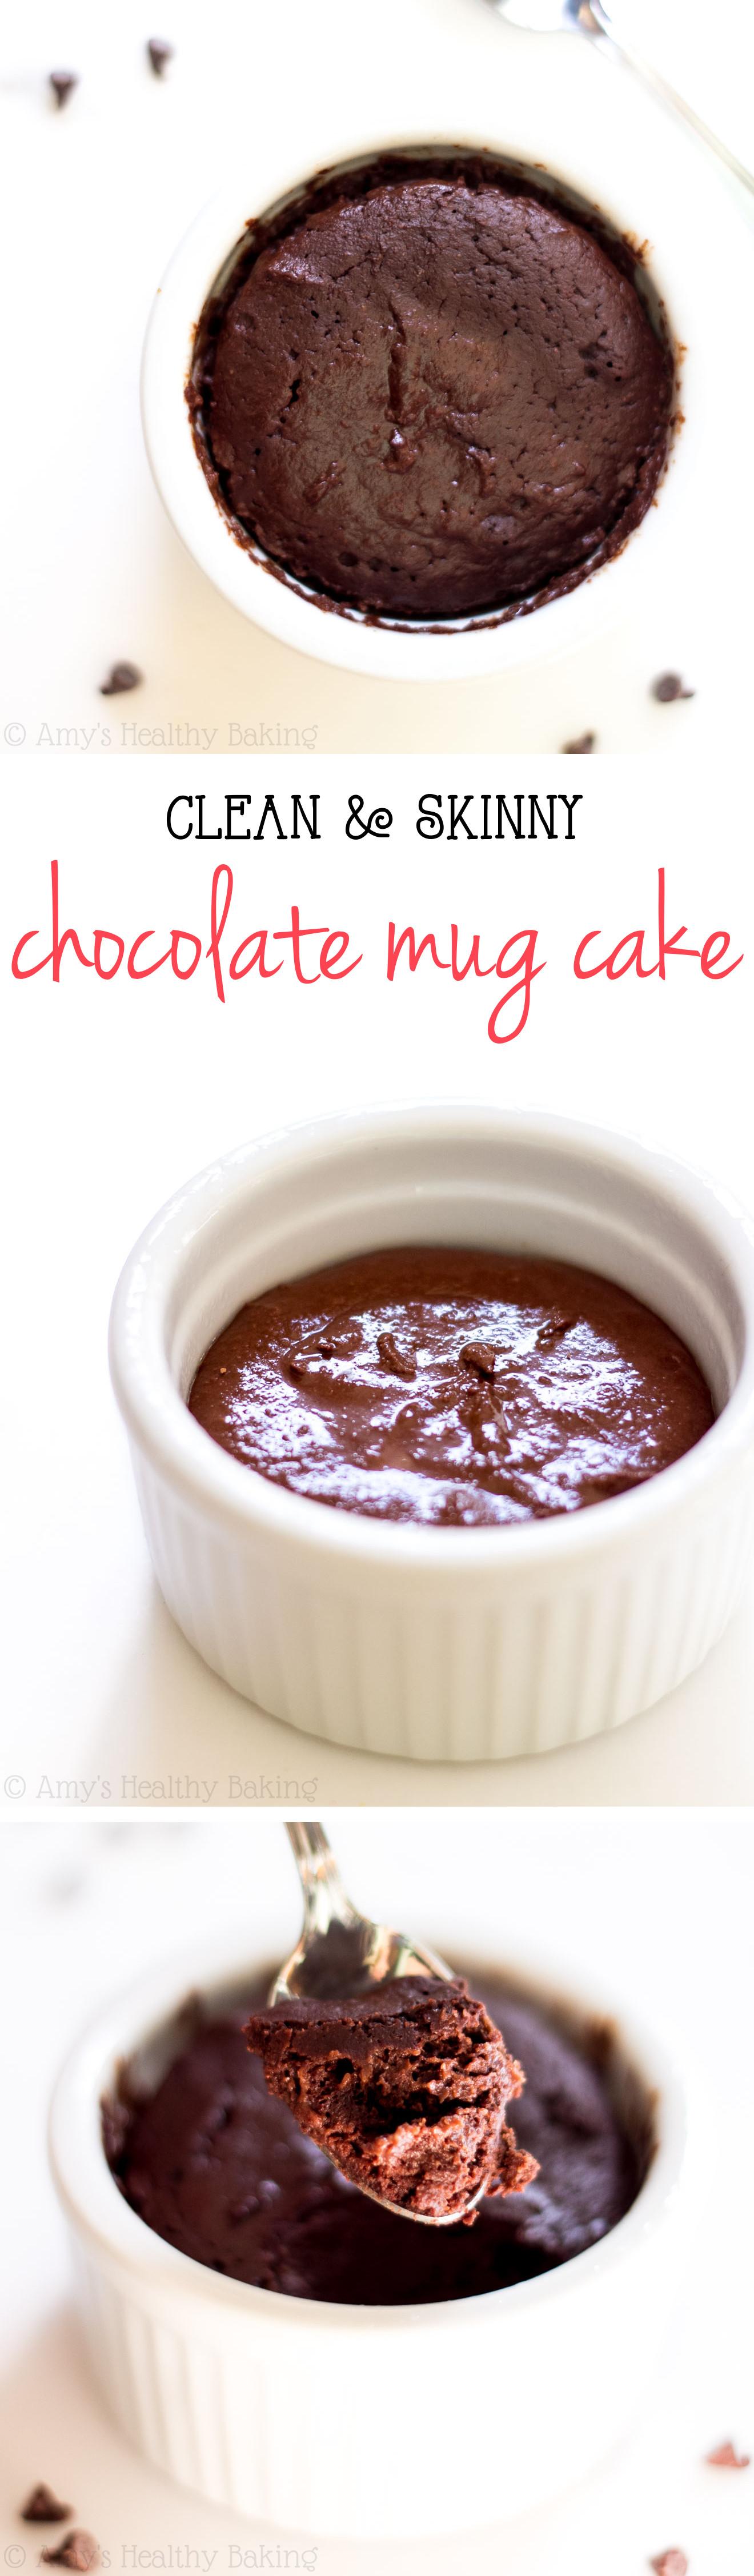 Mug Cake Recipe  Single Serving Clean Chocolate Mug Cake Recipe Video